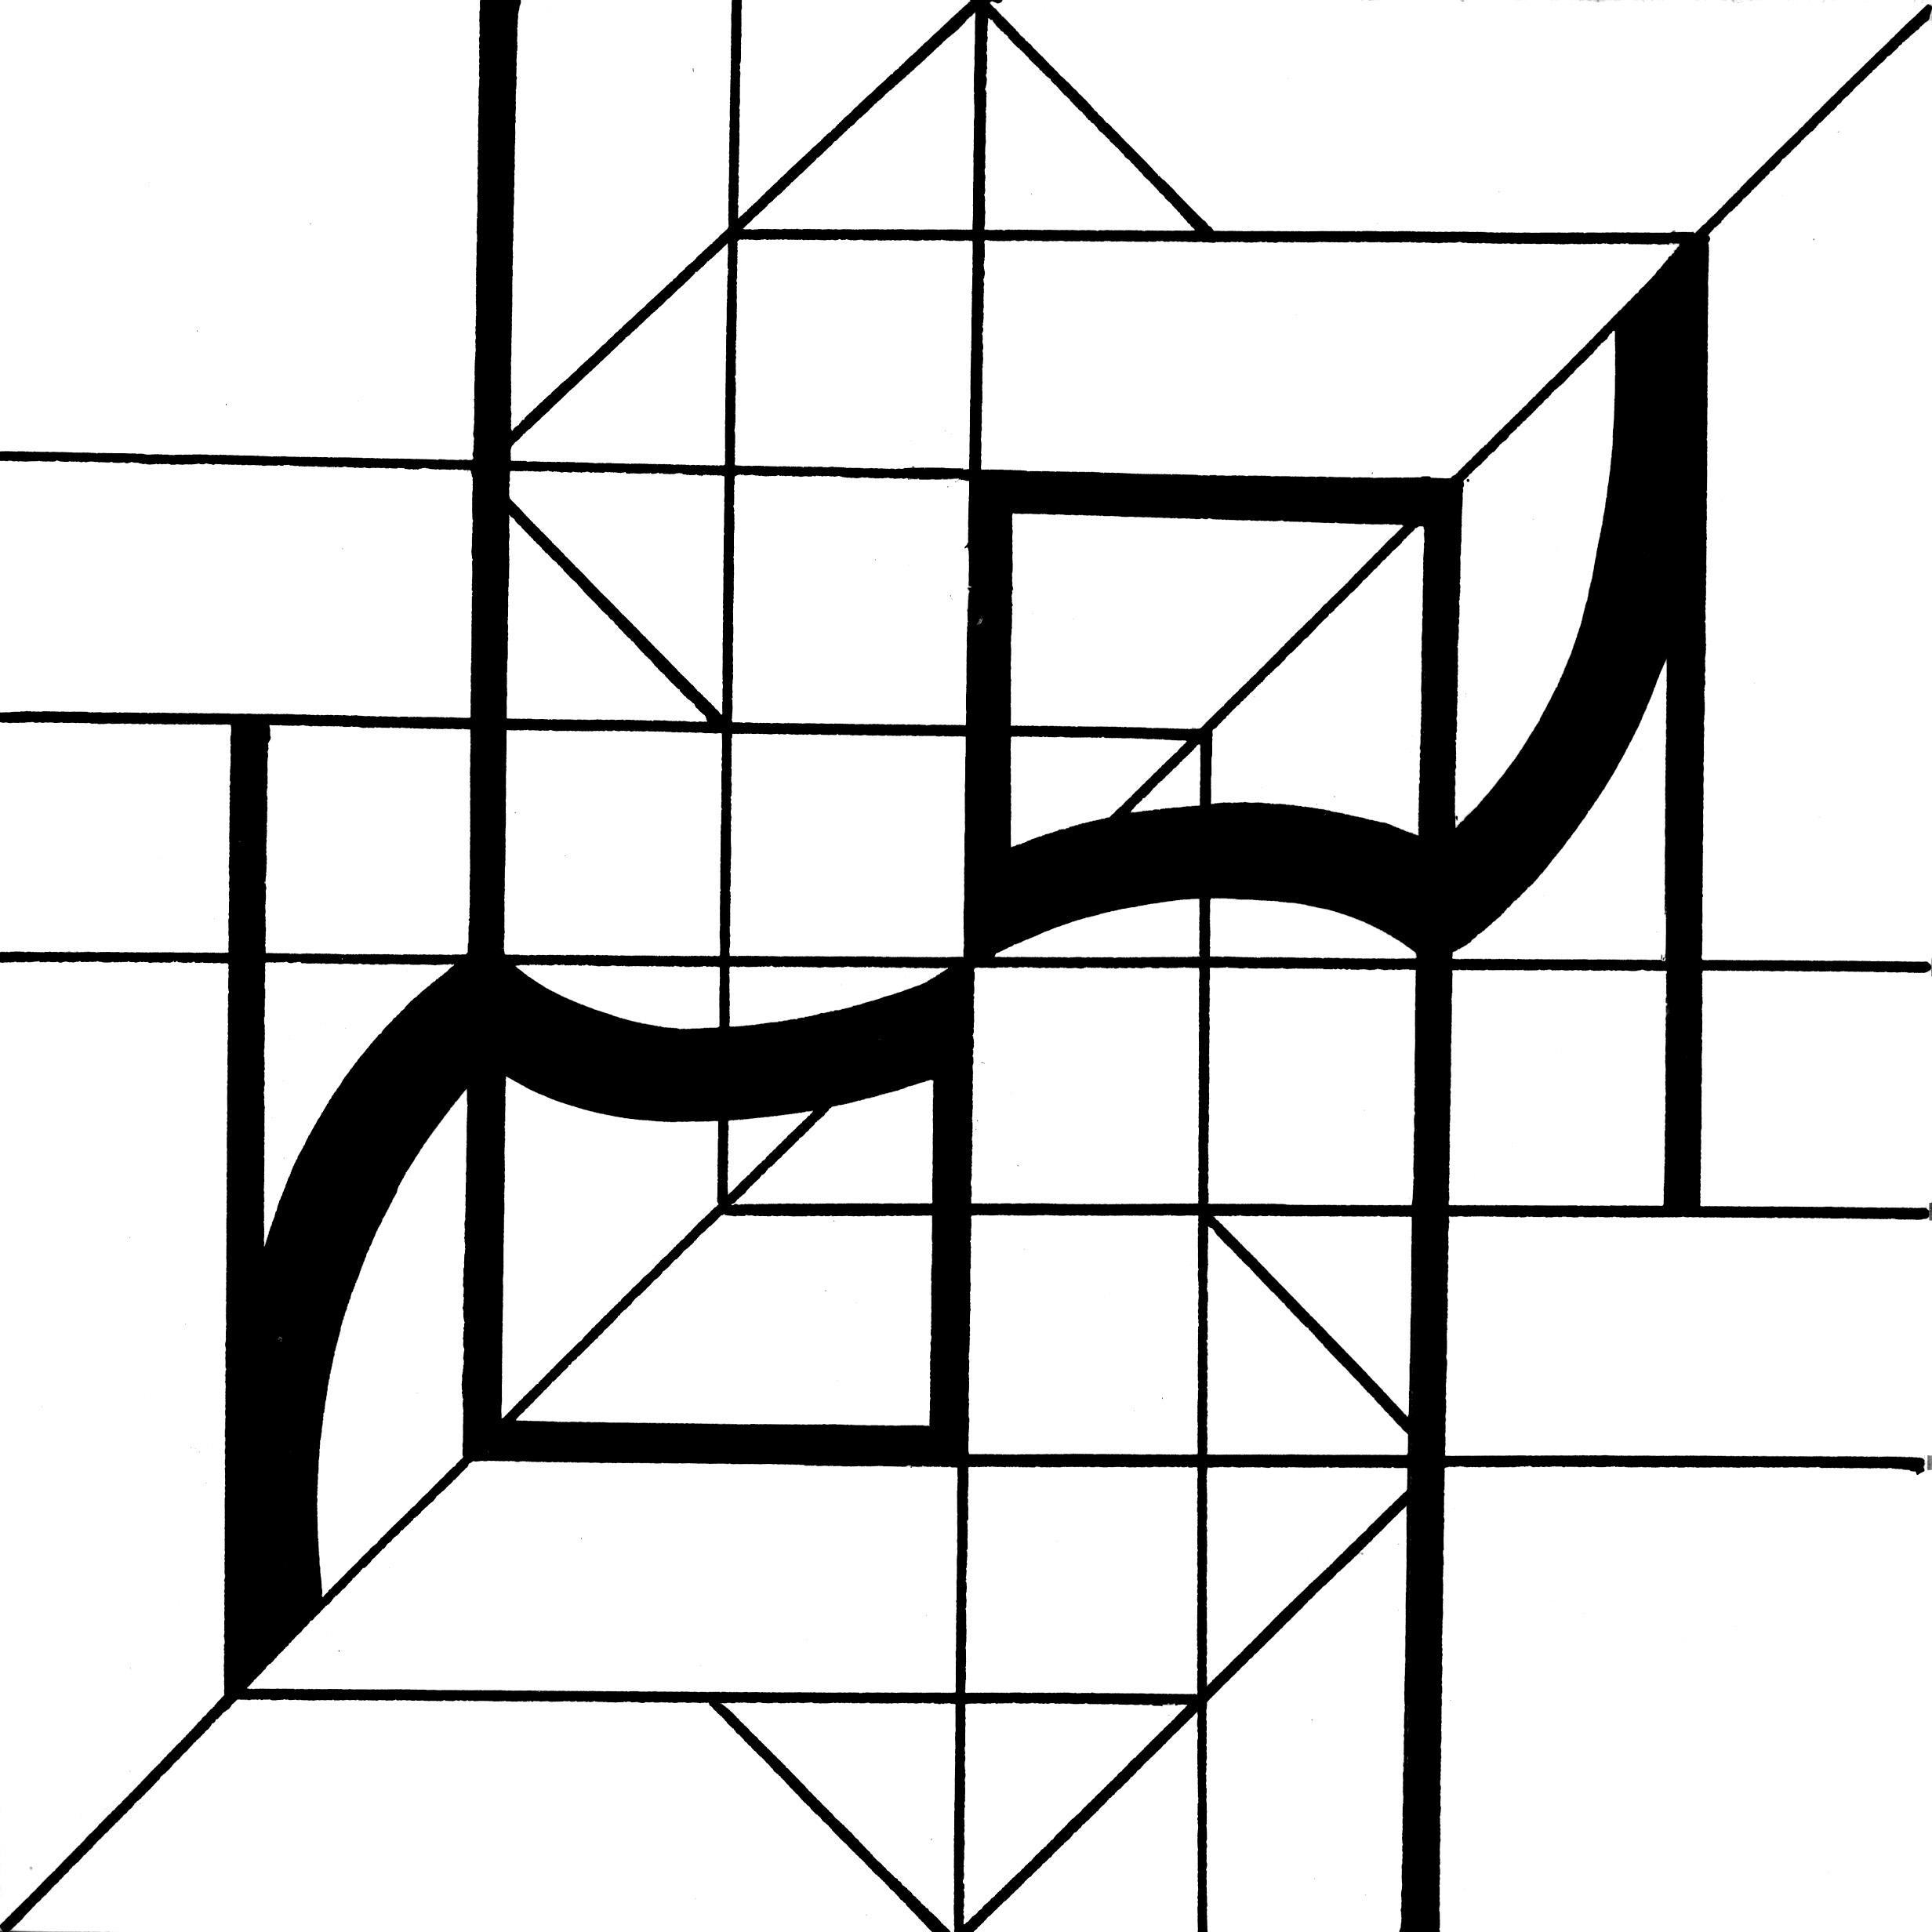 симметрия картинки с линиями где данный момент